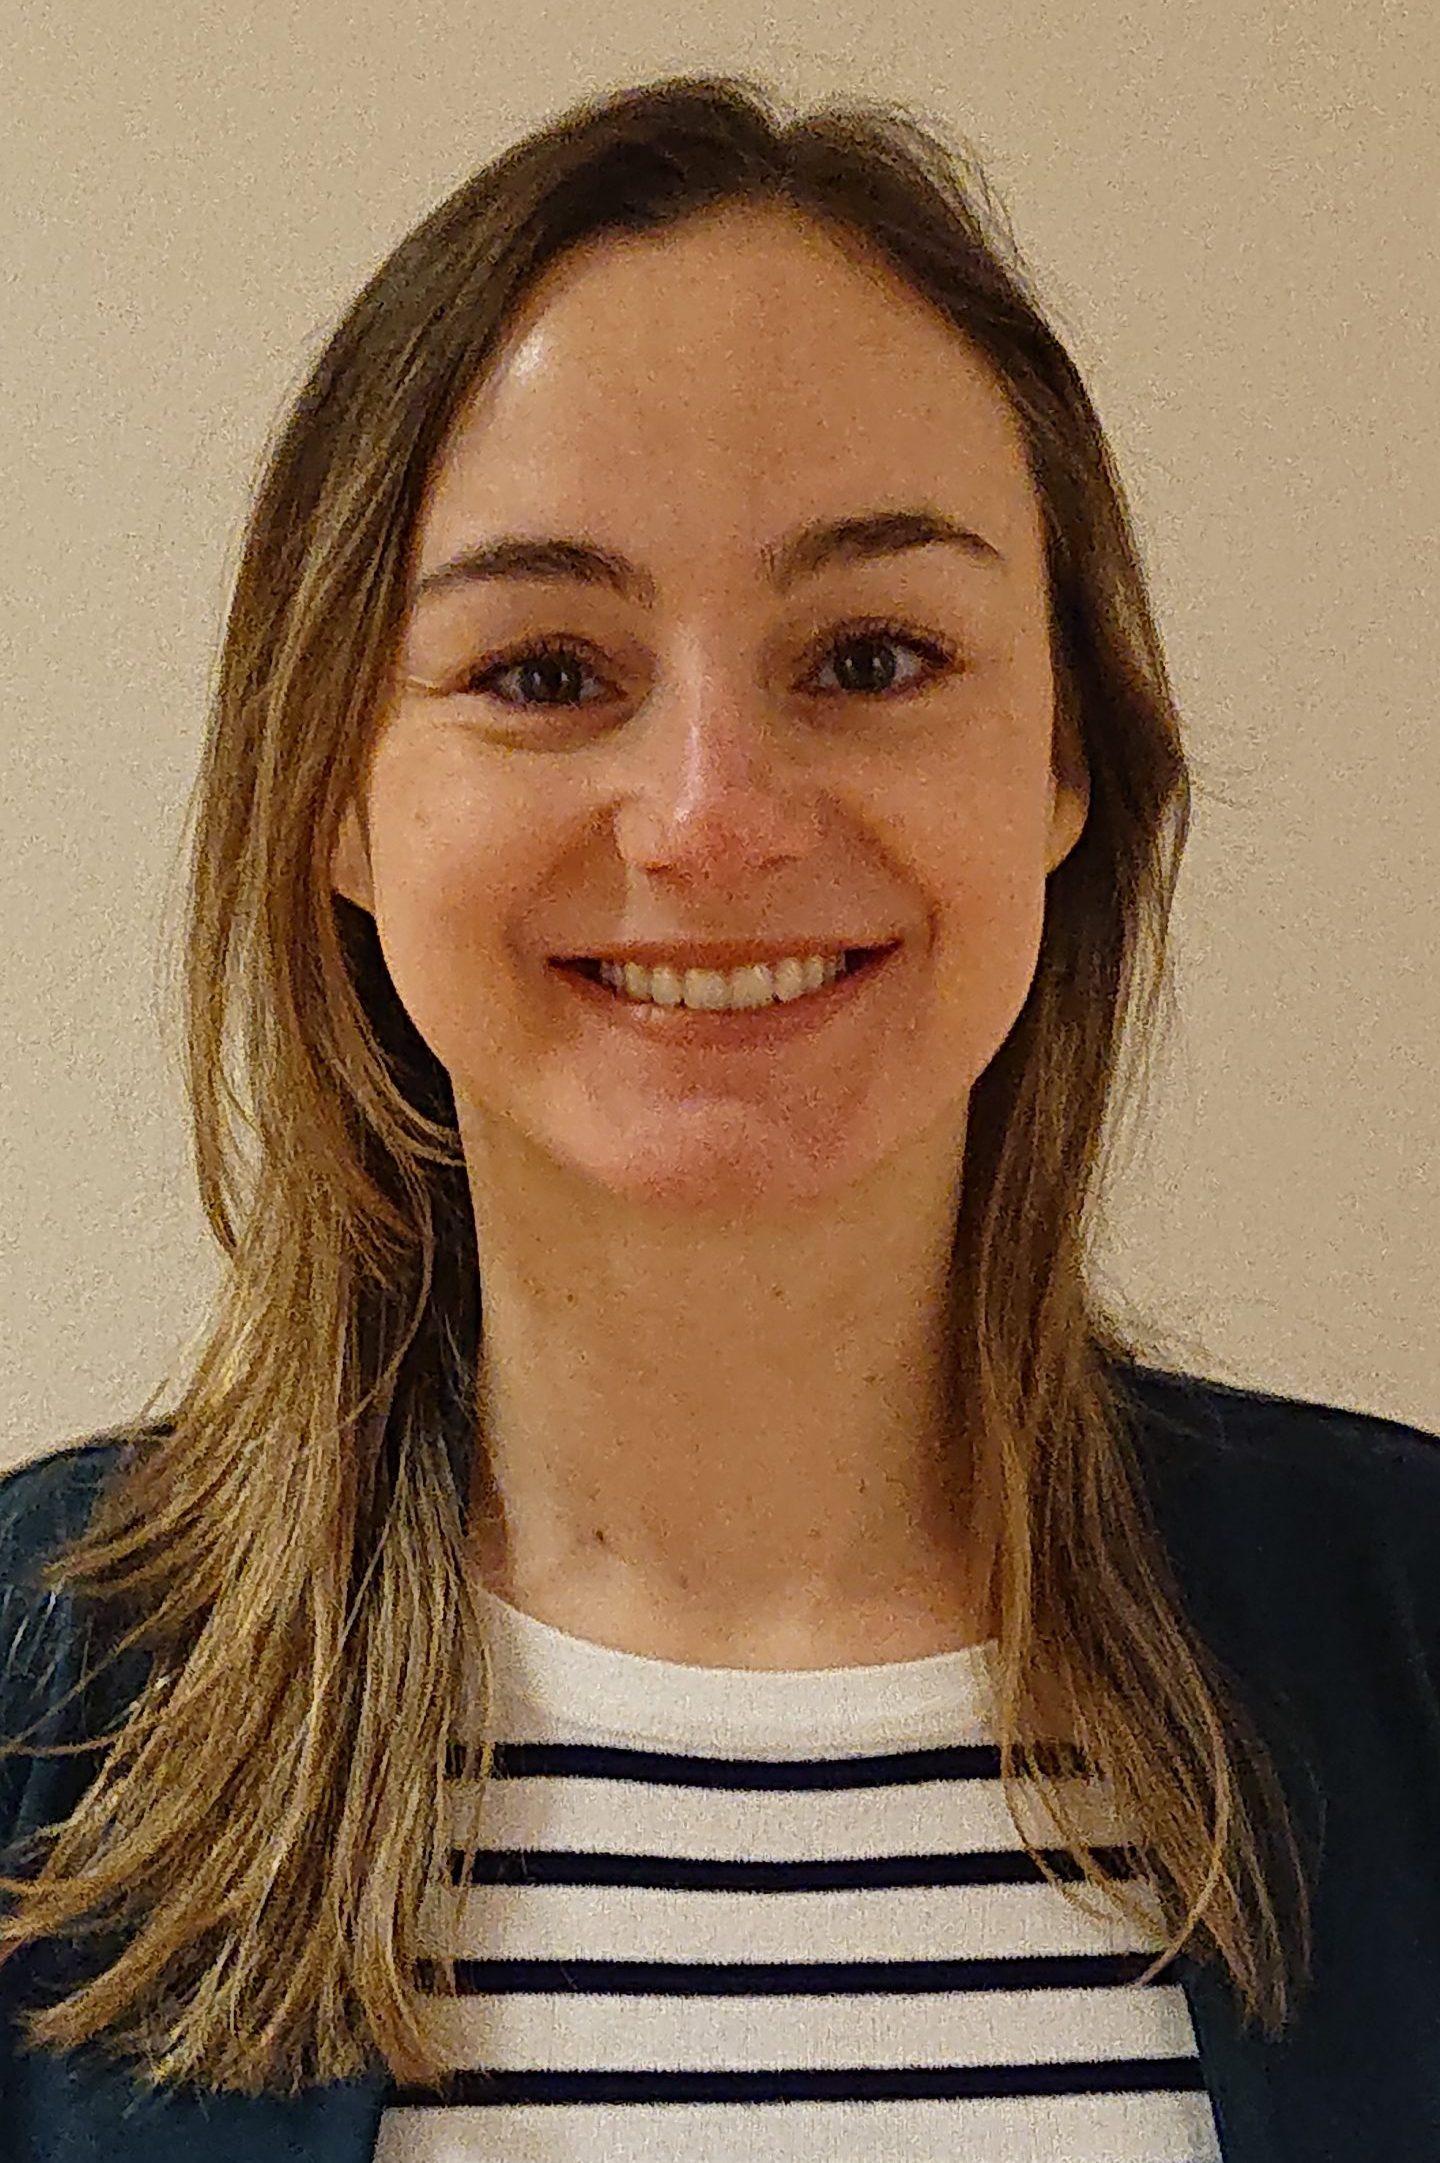 Vivian Oliveira Nunes Teixeira